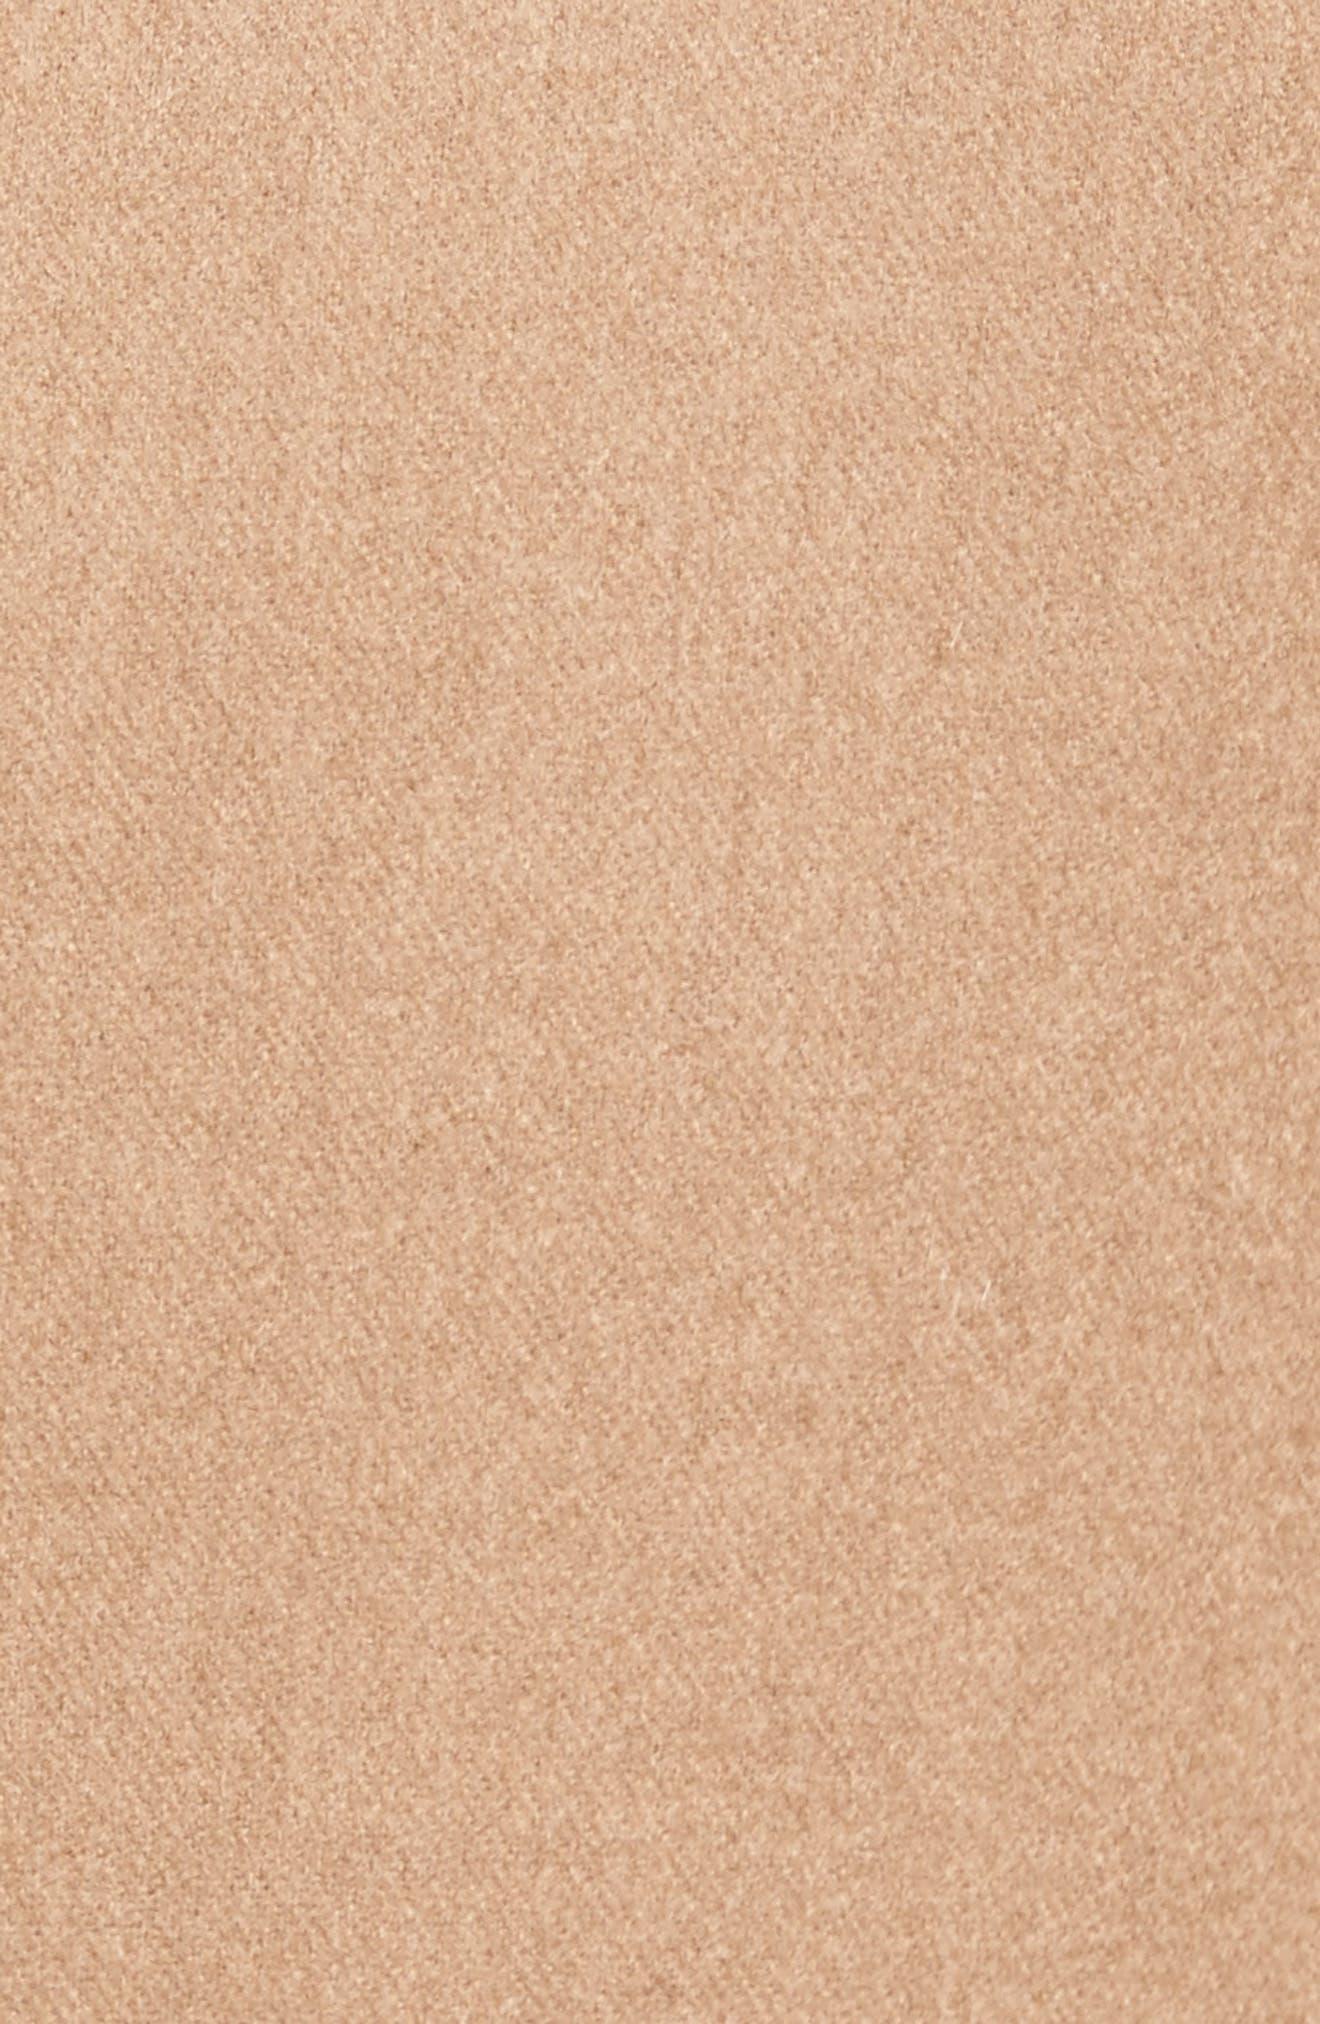 Trim Fit Camel Hair Blazer,                             Alternate thumbnail 5, color,                             Camel